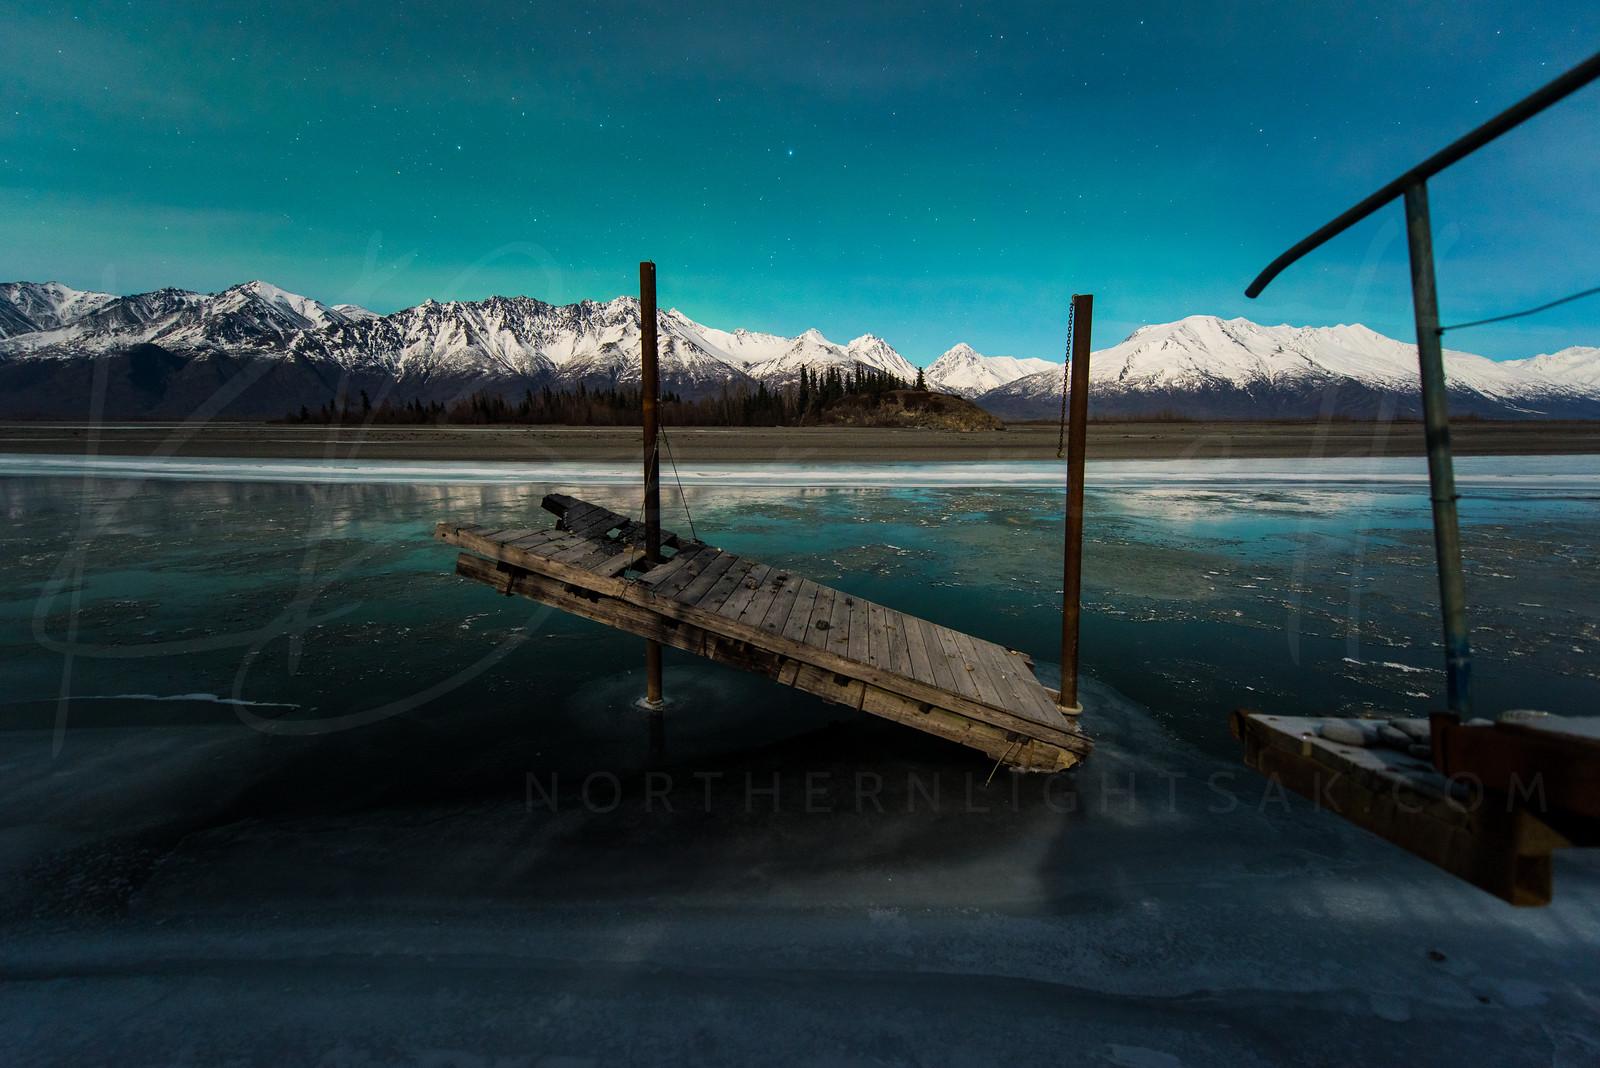 #Dock with faint Aurora - P/@kbdesignphoto